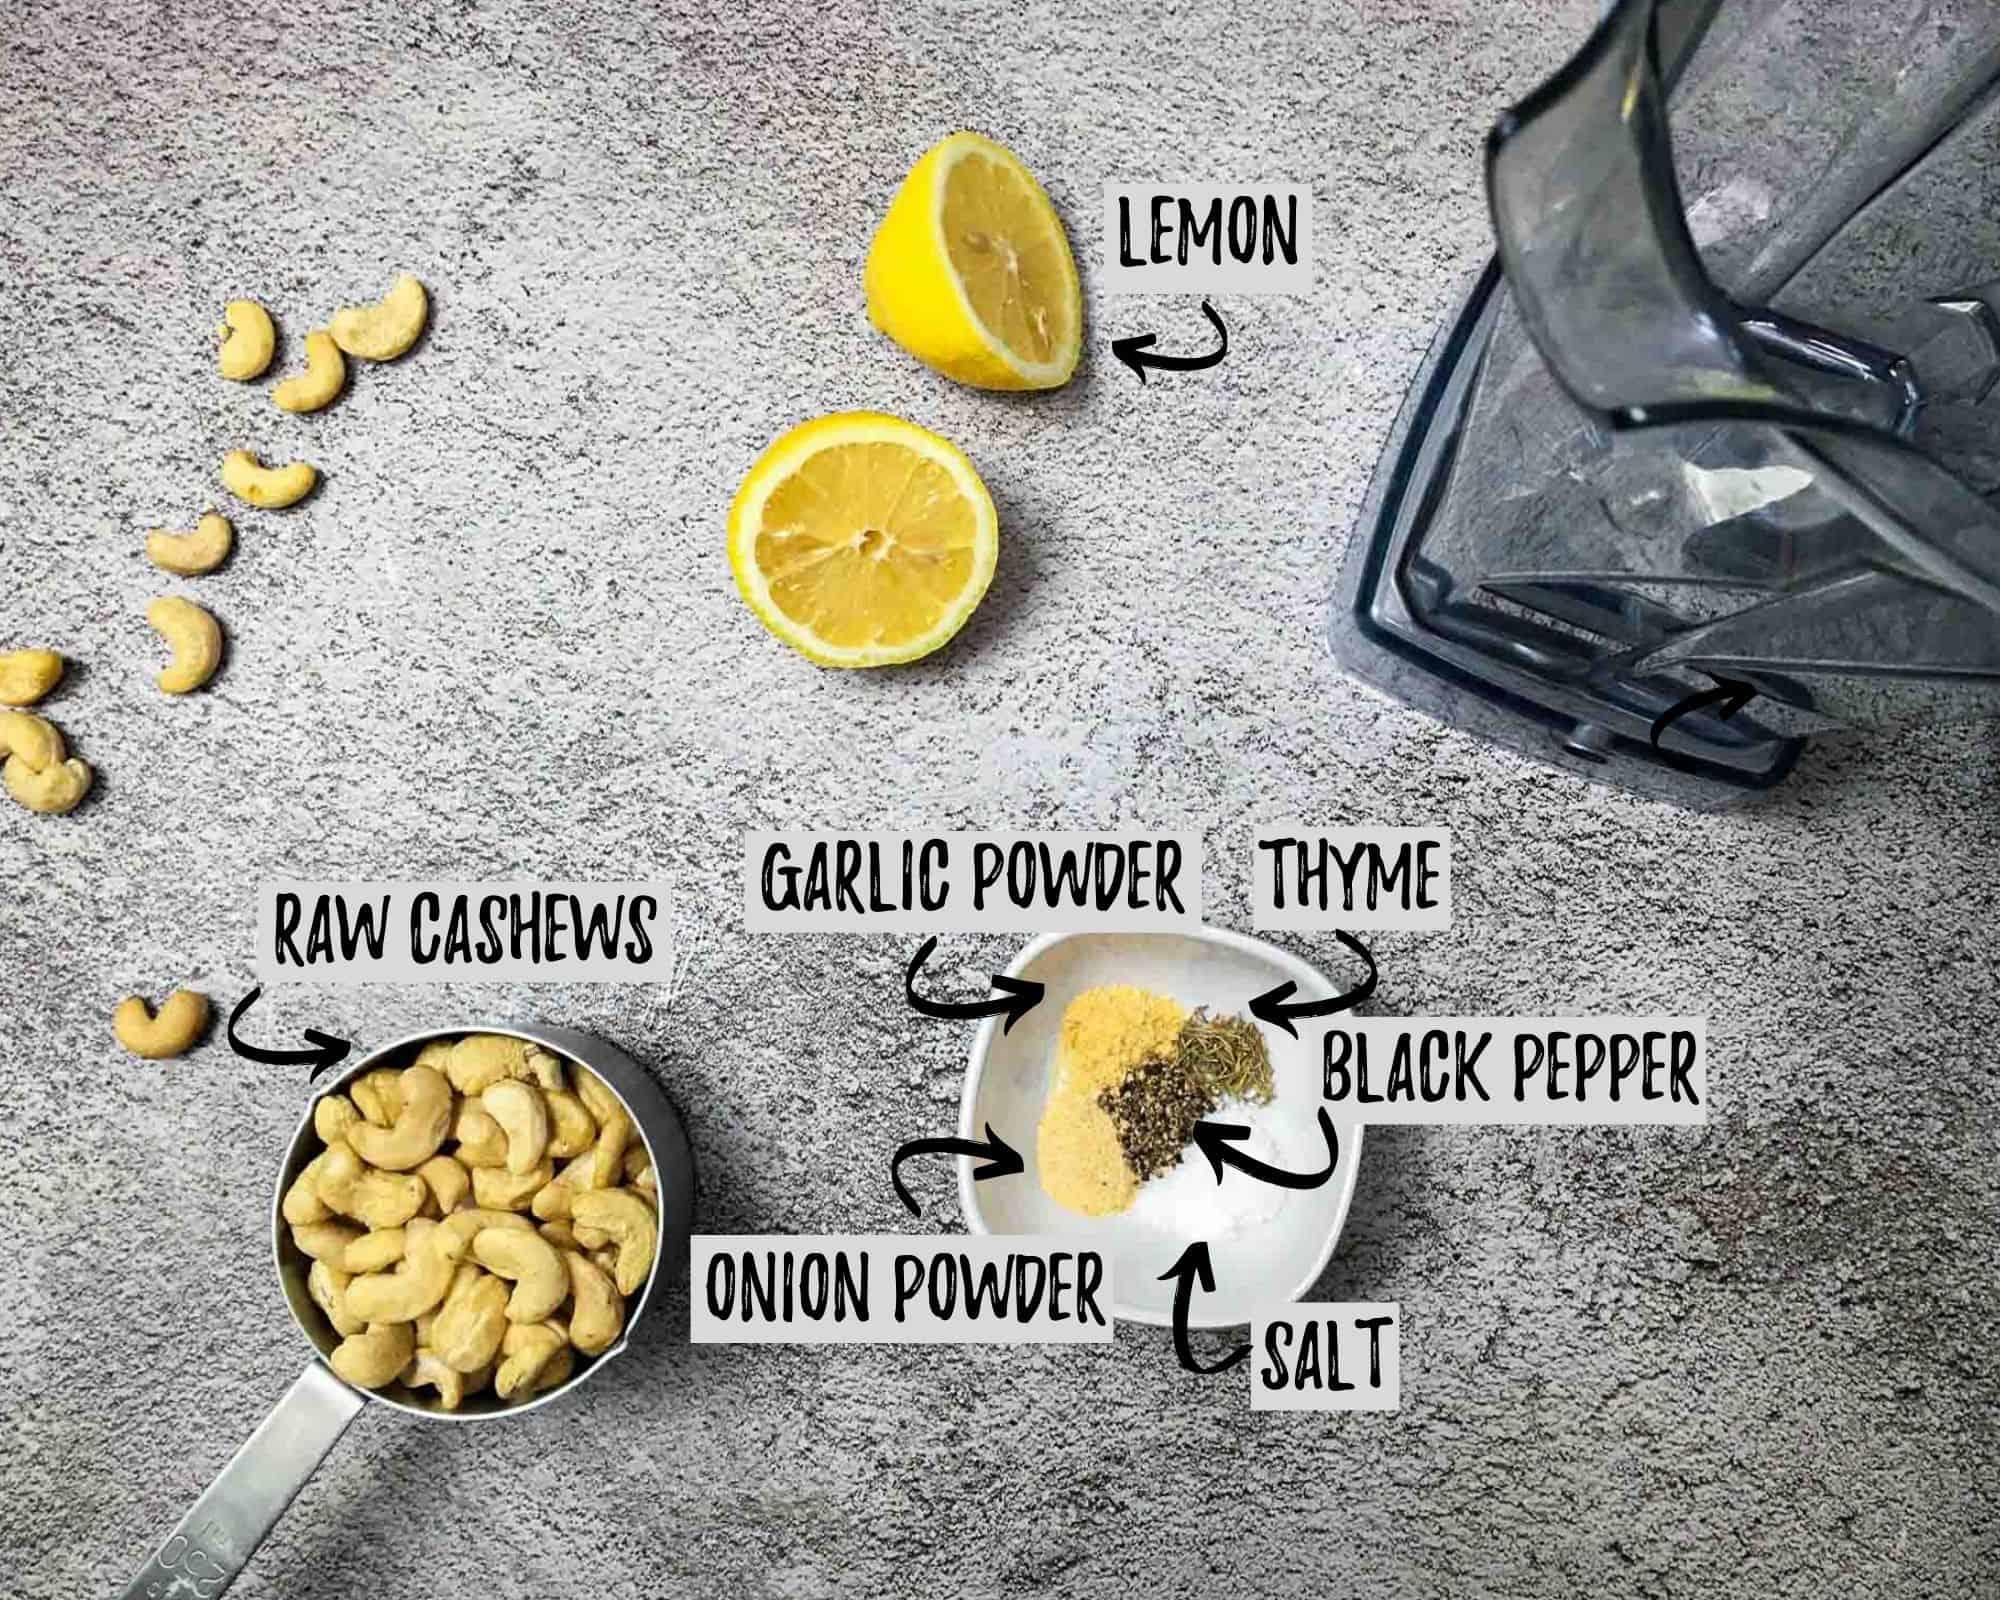 cashews, lemon cut in half and bowl of seasoning on concrete surface